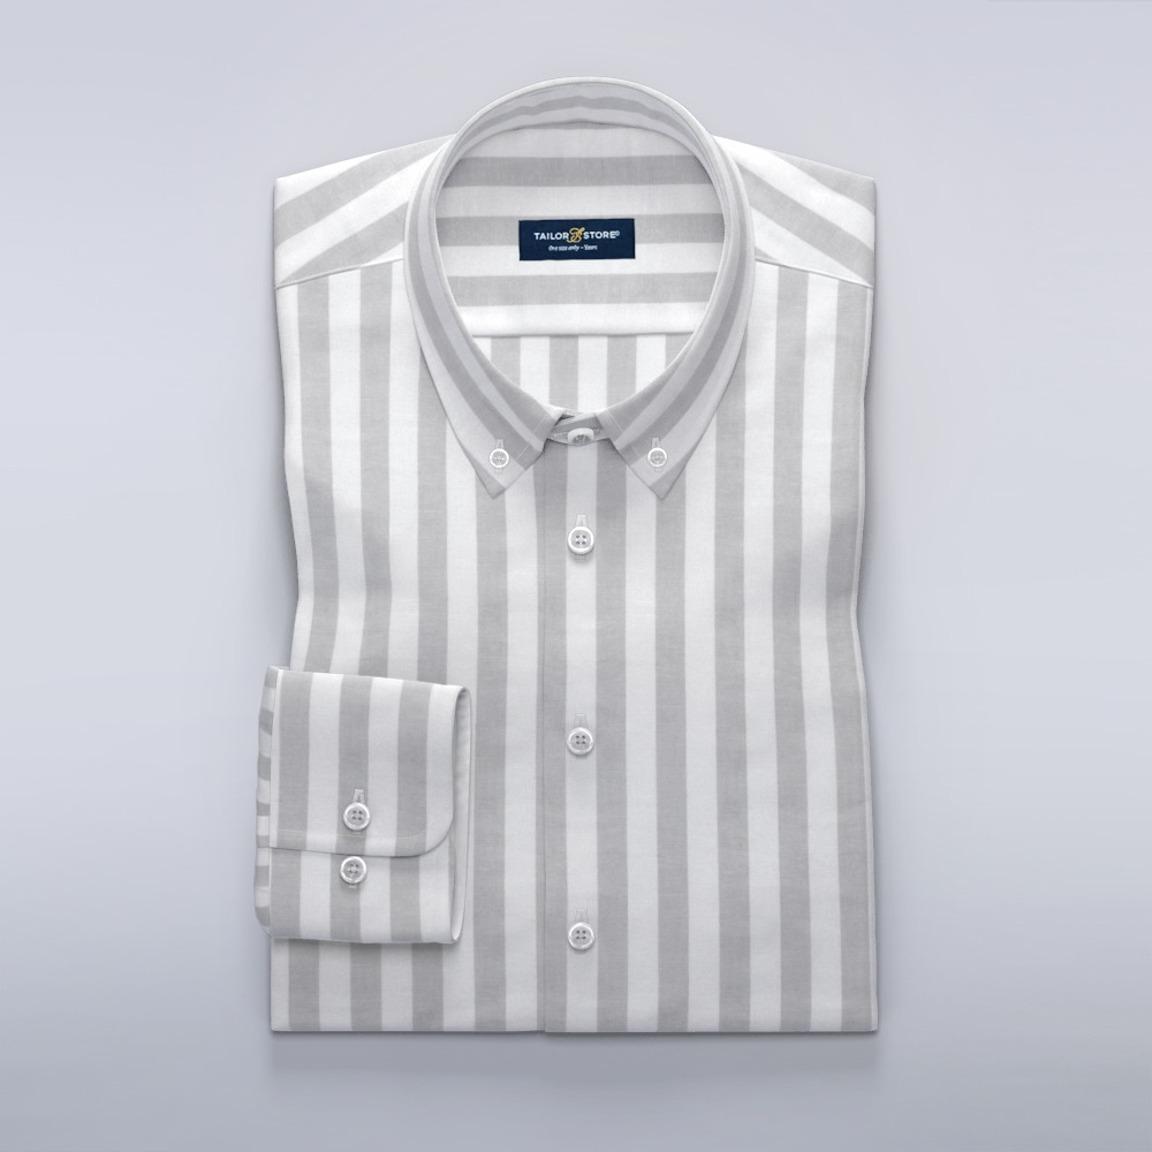 White and light gray striped dress shirt